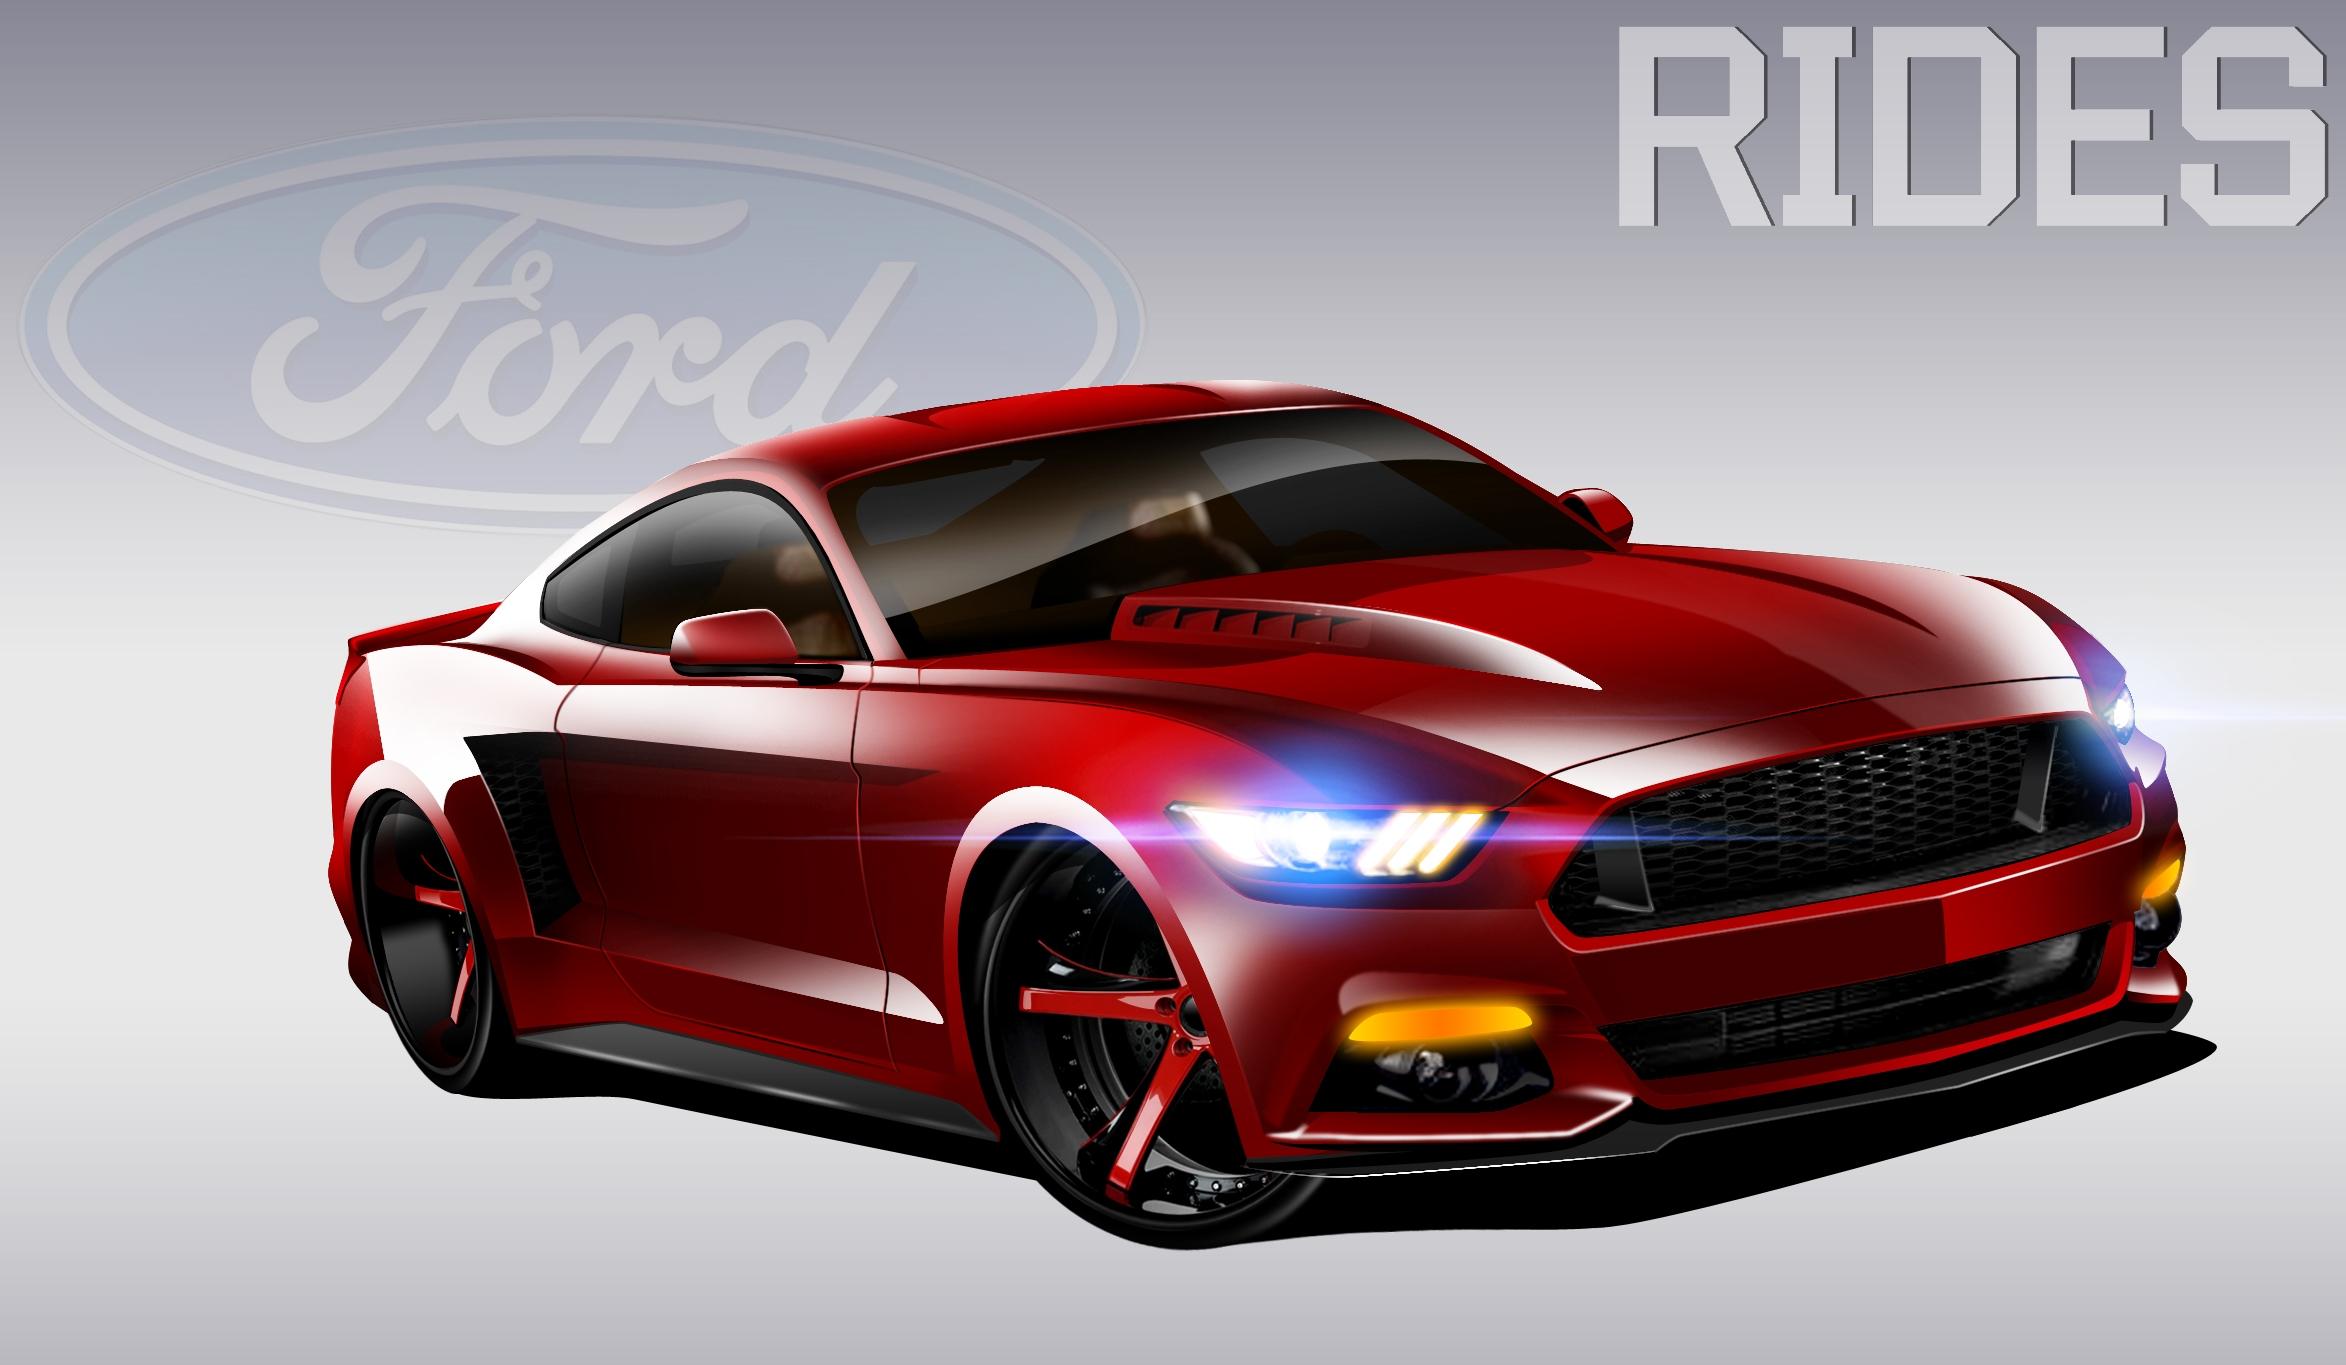 Widebody 2015 Mustang Concept | RIDES Remix - Rides Magazine